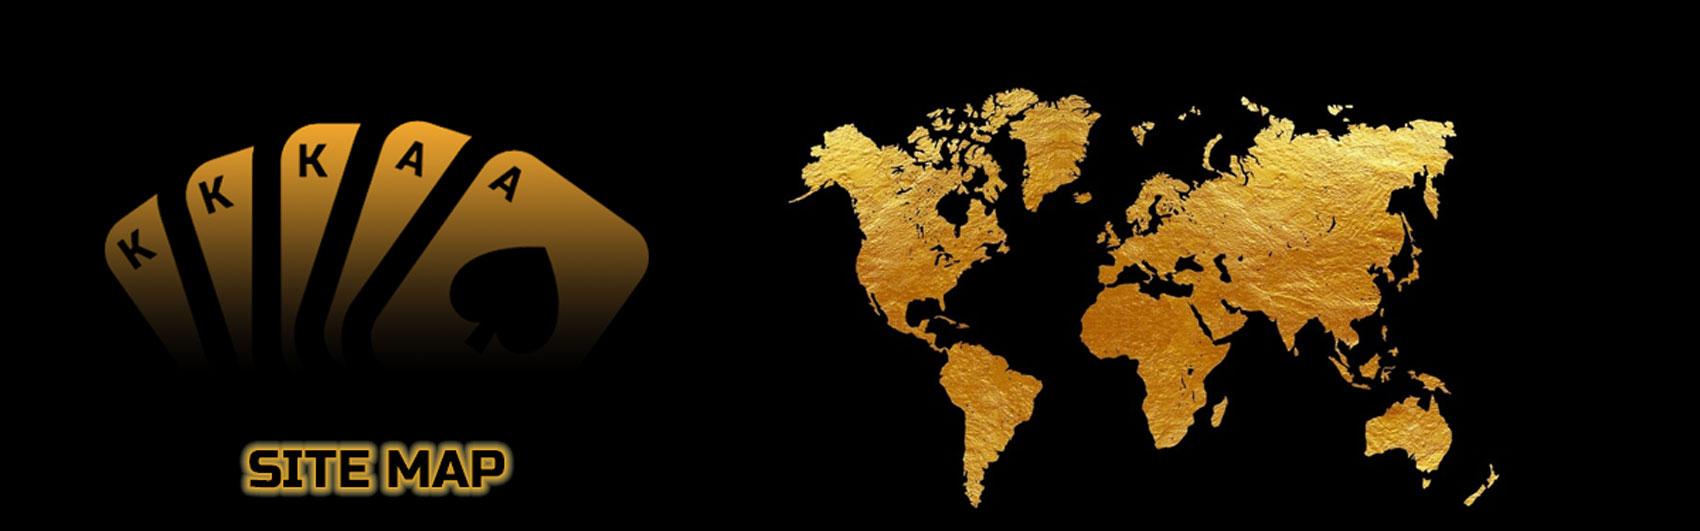 AceHigh Poker Site Map